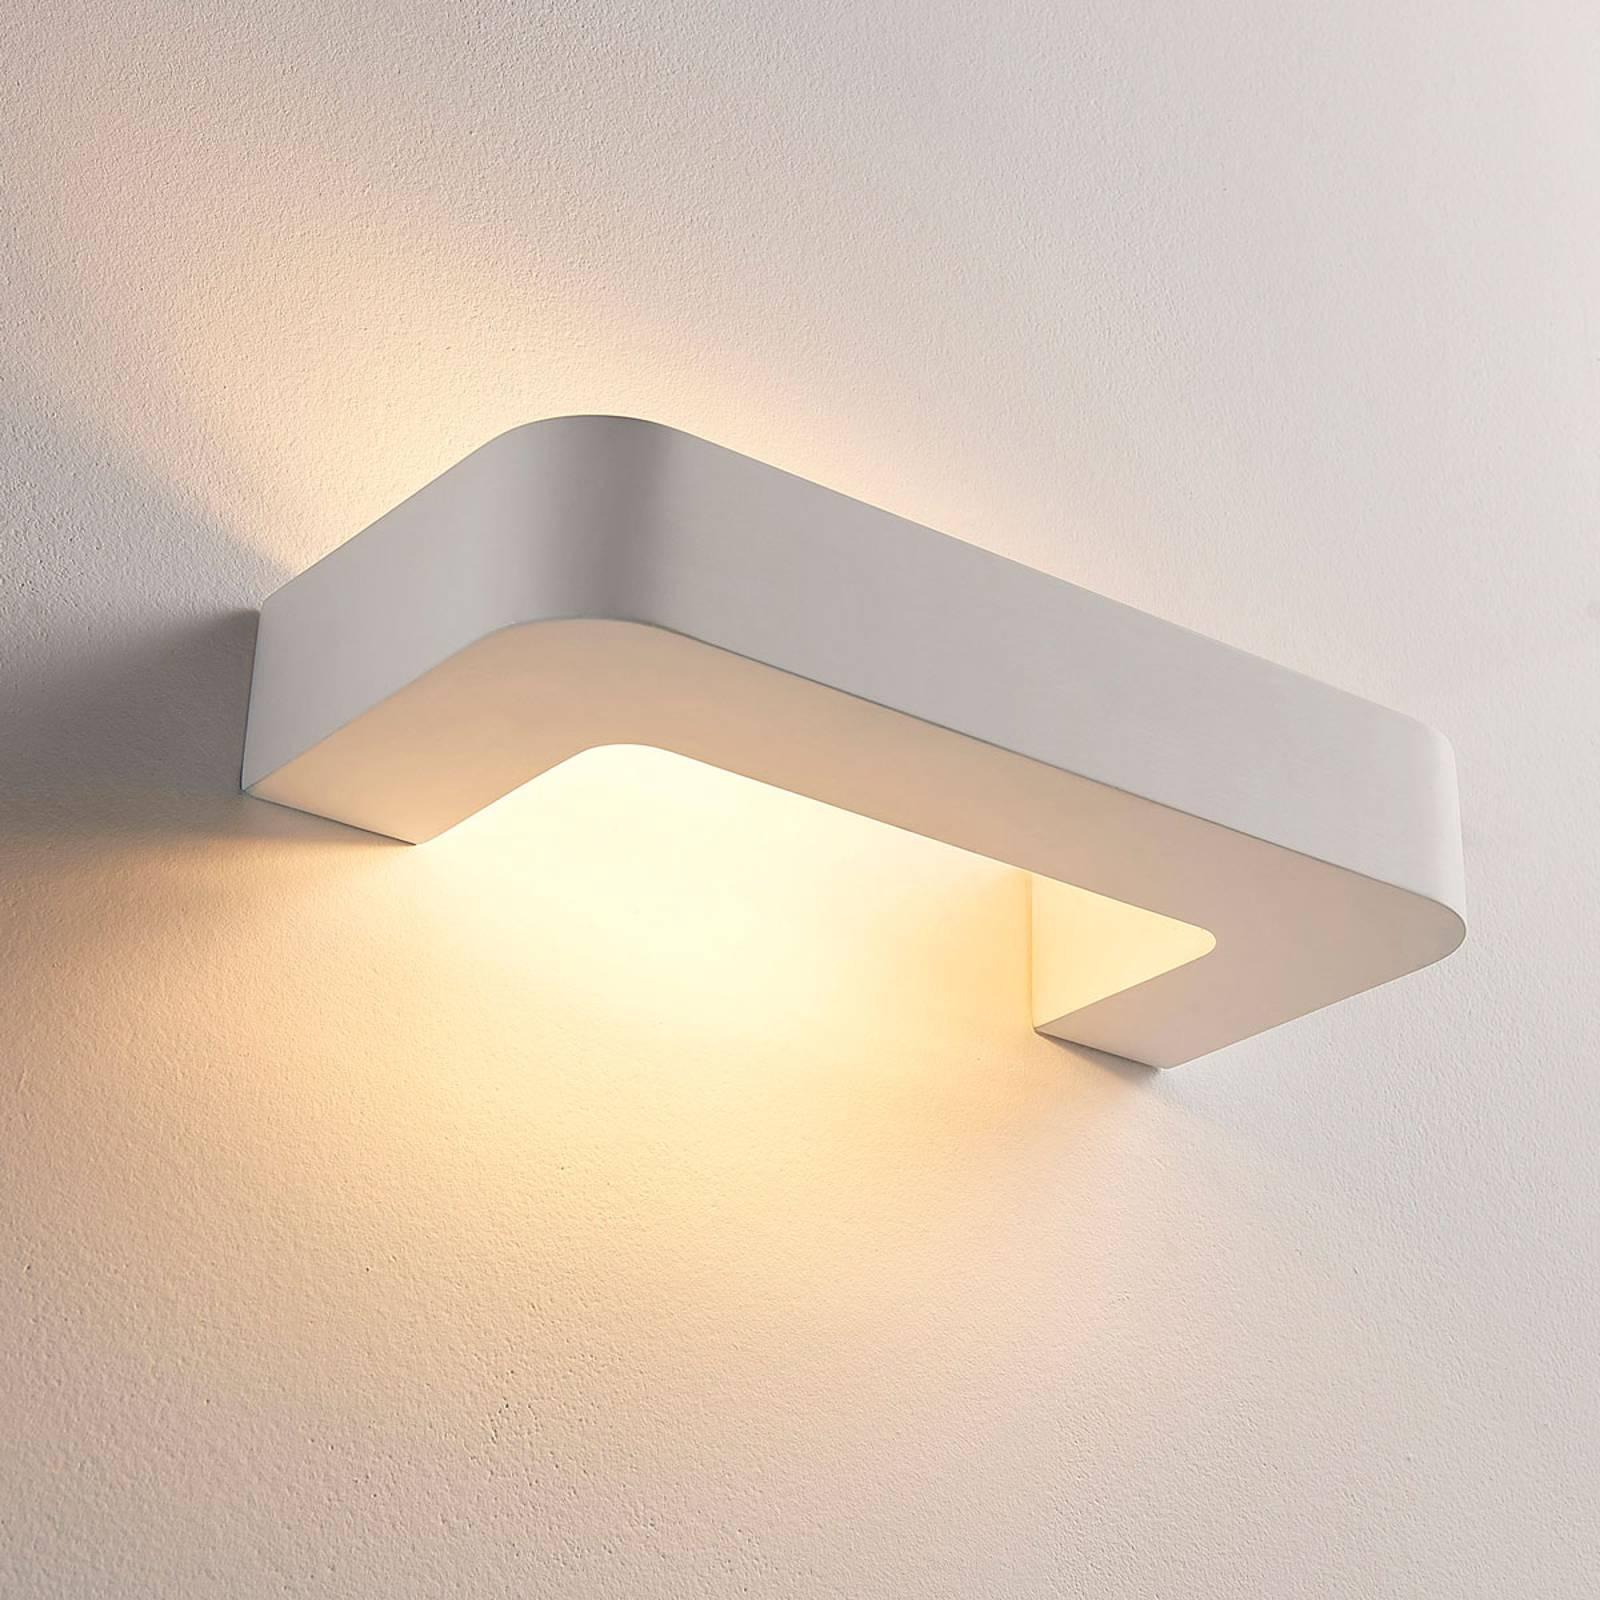 Beugelvormige LED wandlamp Julika, wit gips